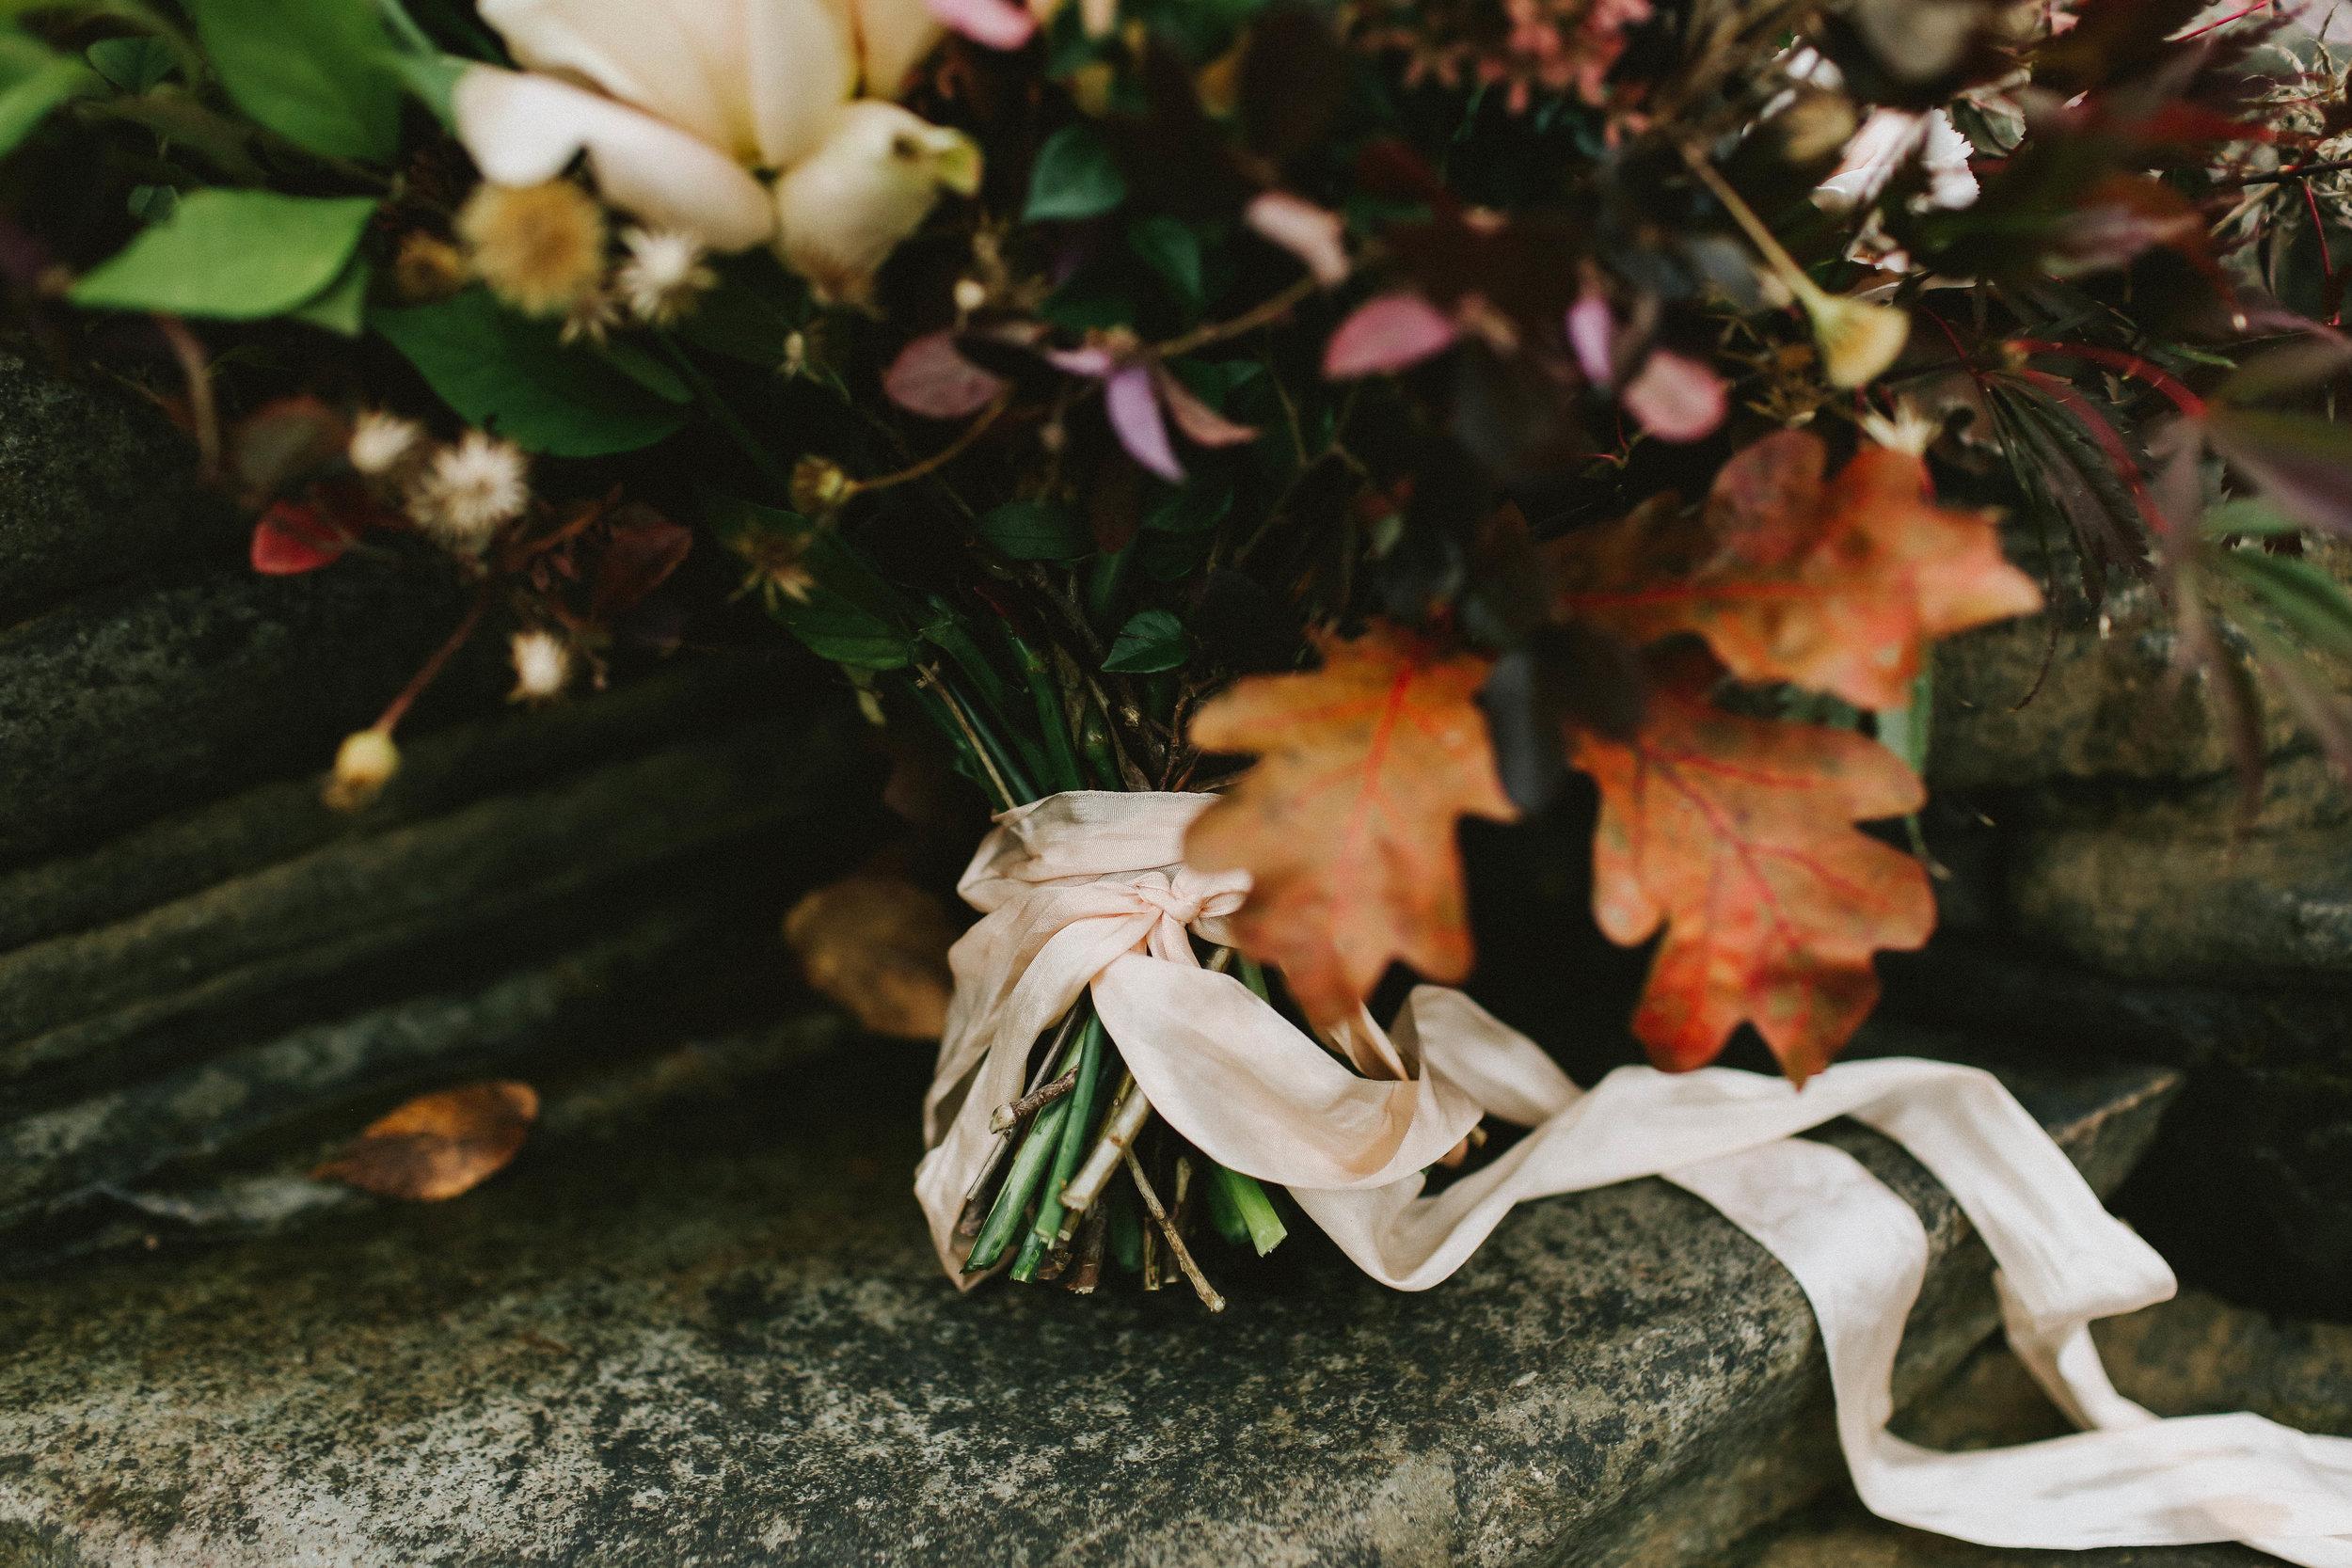 Fall Wedding Shoot - Autumn Wedding Ideas and Inspiration